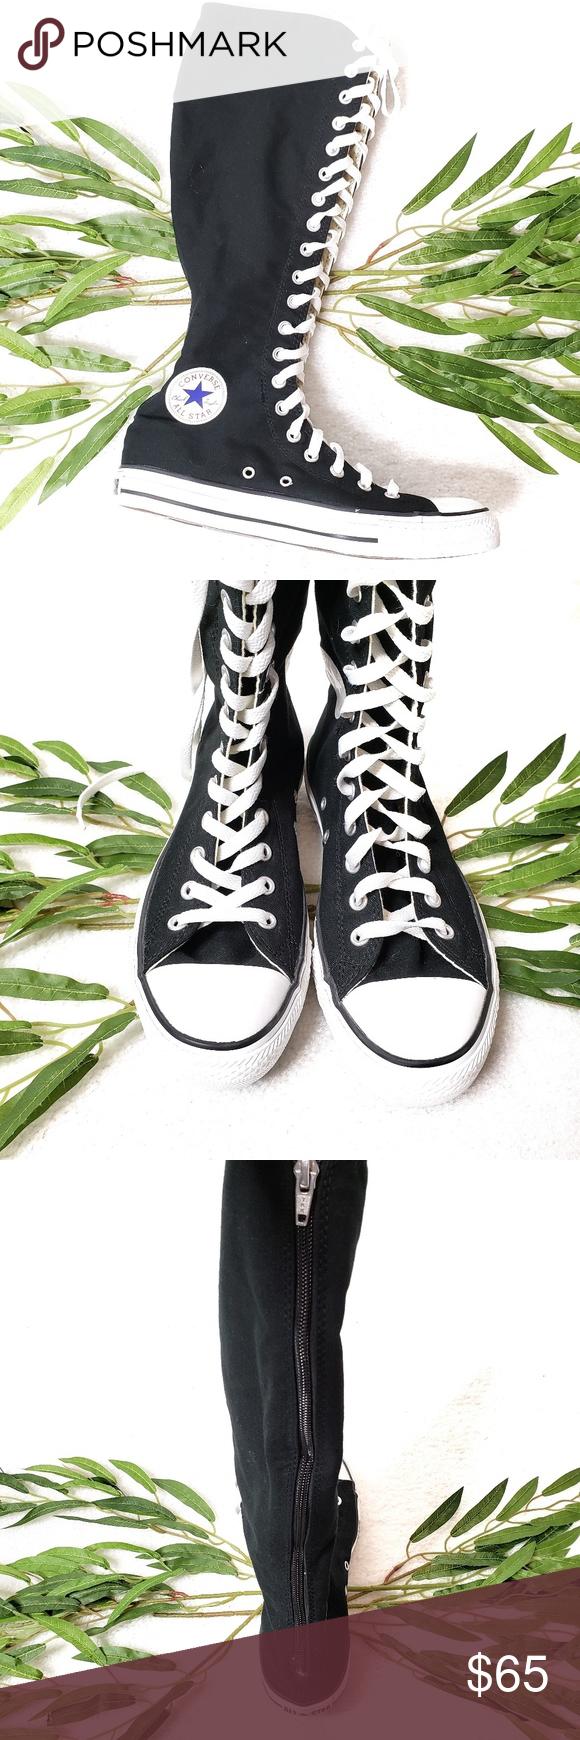 Converse Chuck Taylor Knee High Black Virtually new! Worn